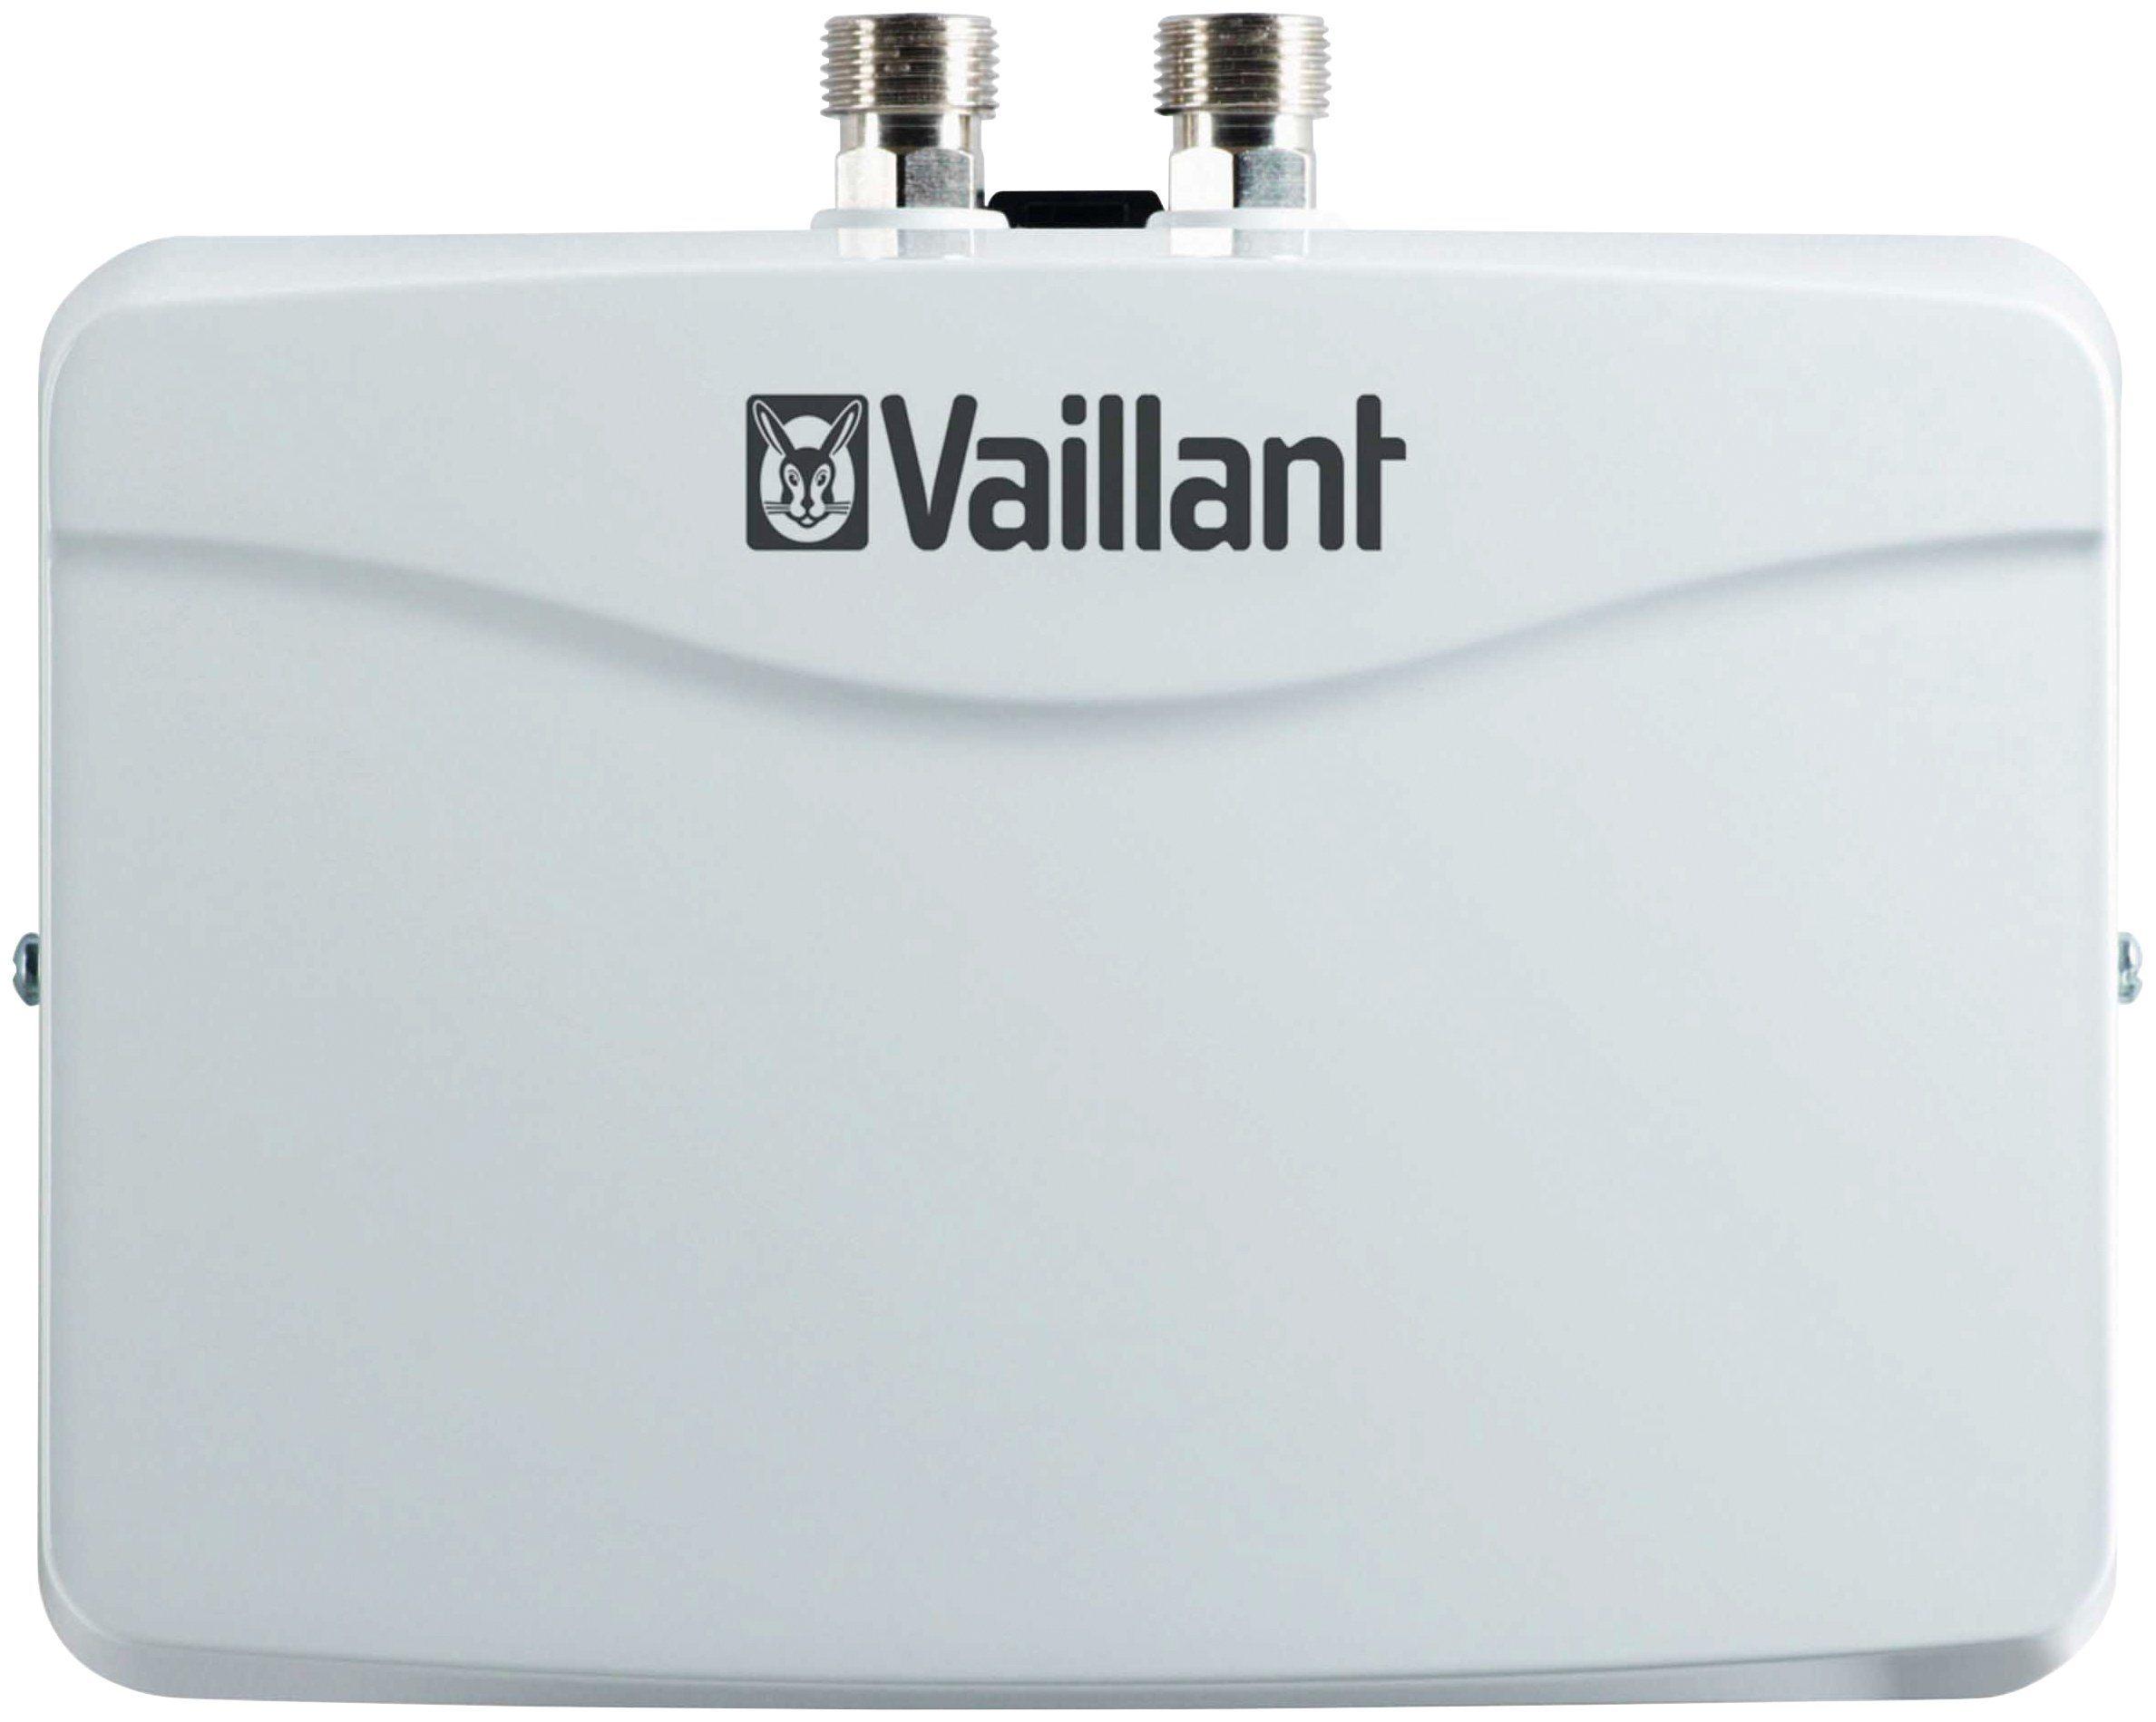 VAILLANT Durchlauferhitzer »MINIVEDH3/2N«, Mini-Durchlauferhitzer | Baumarkt > Heizung und Klima > Durchlauferhitzer | Vaillant